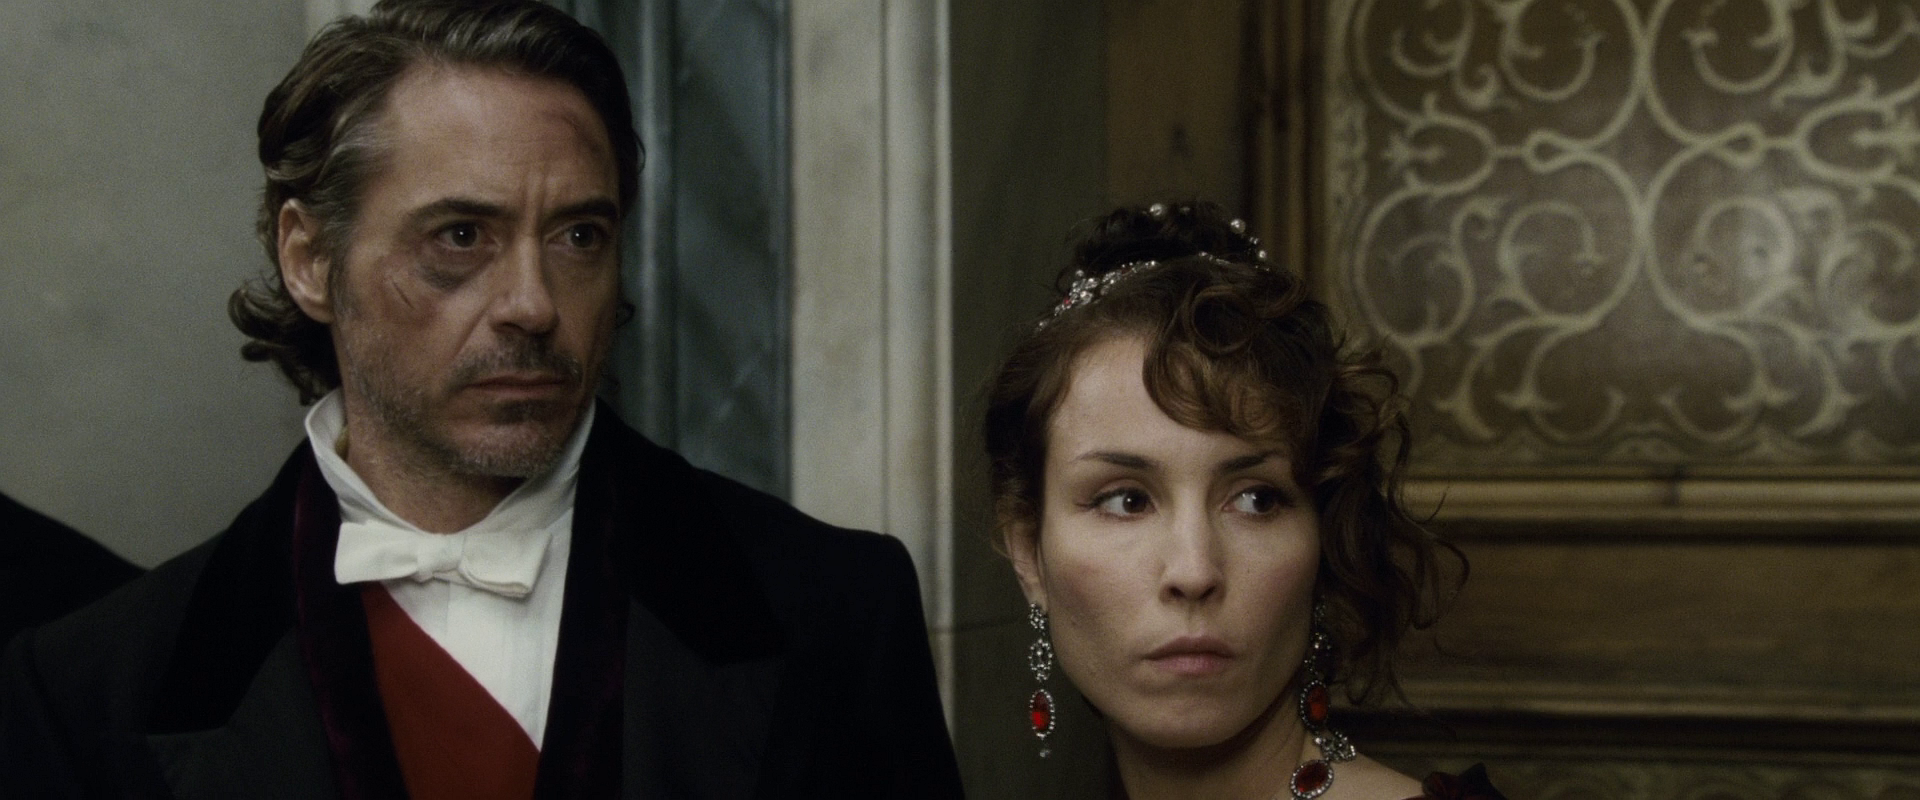 Шерлок Холмс: Дилогия / Sherlock Holmes: Dilogy (2009-2011/BDRip) 1080p, от HELLYWOOD